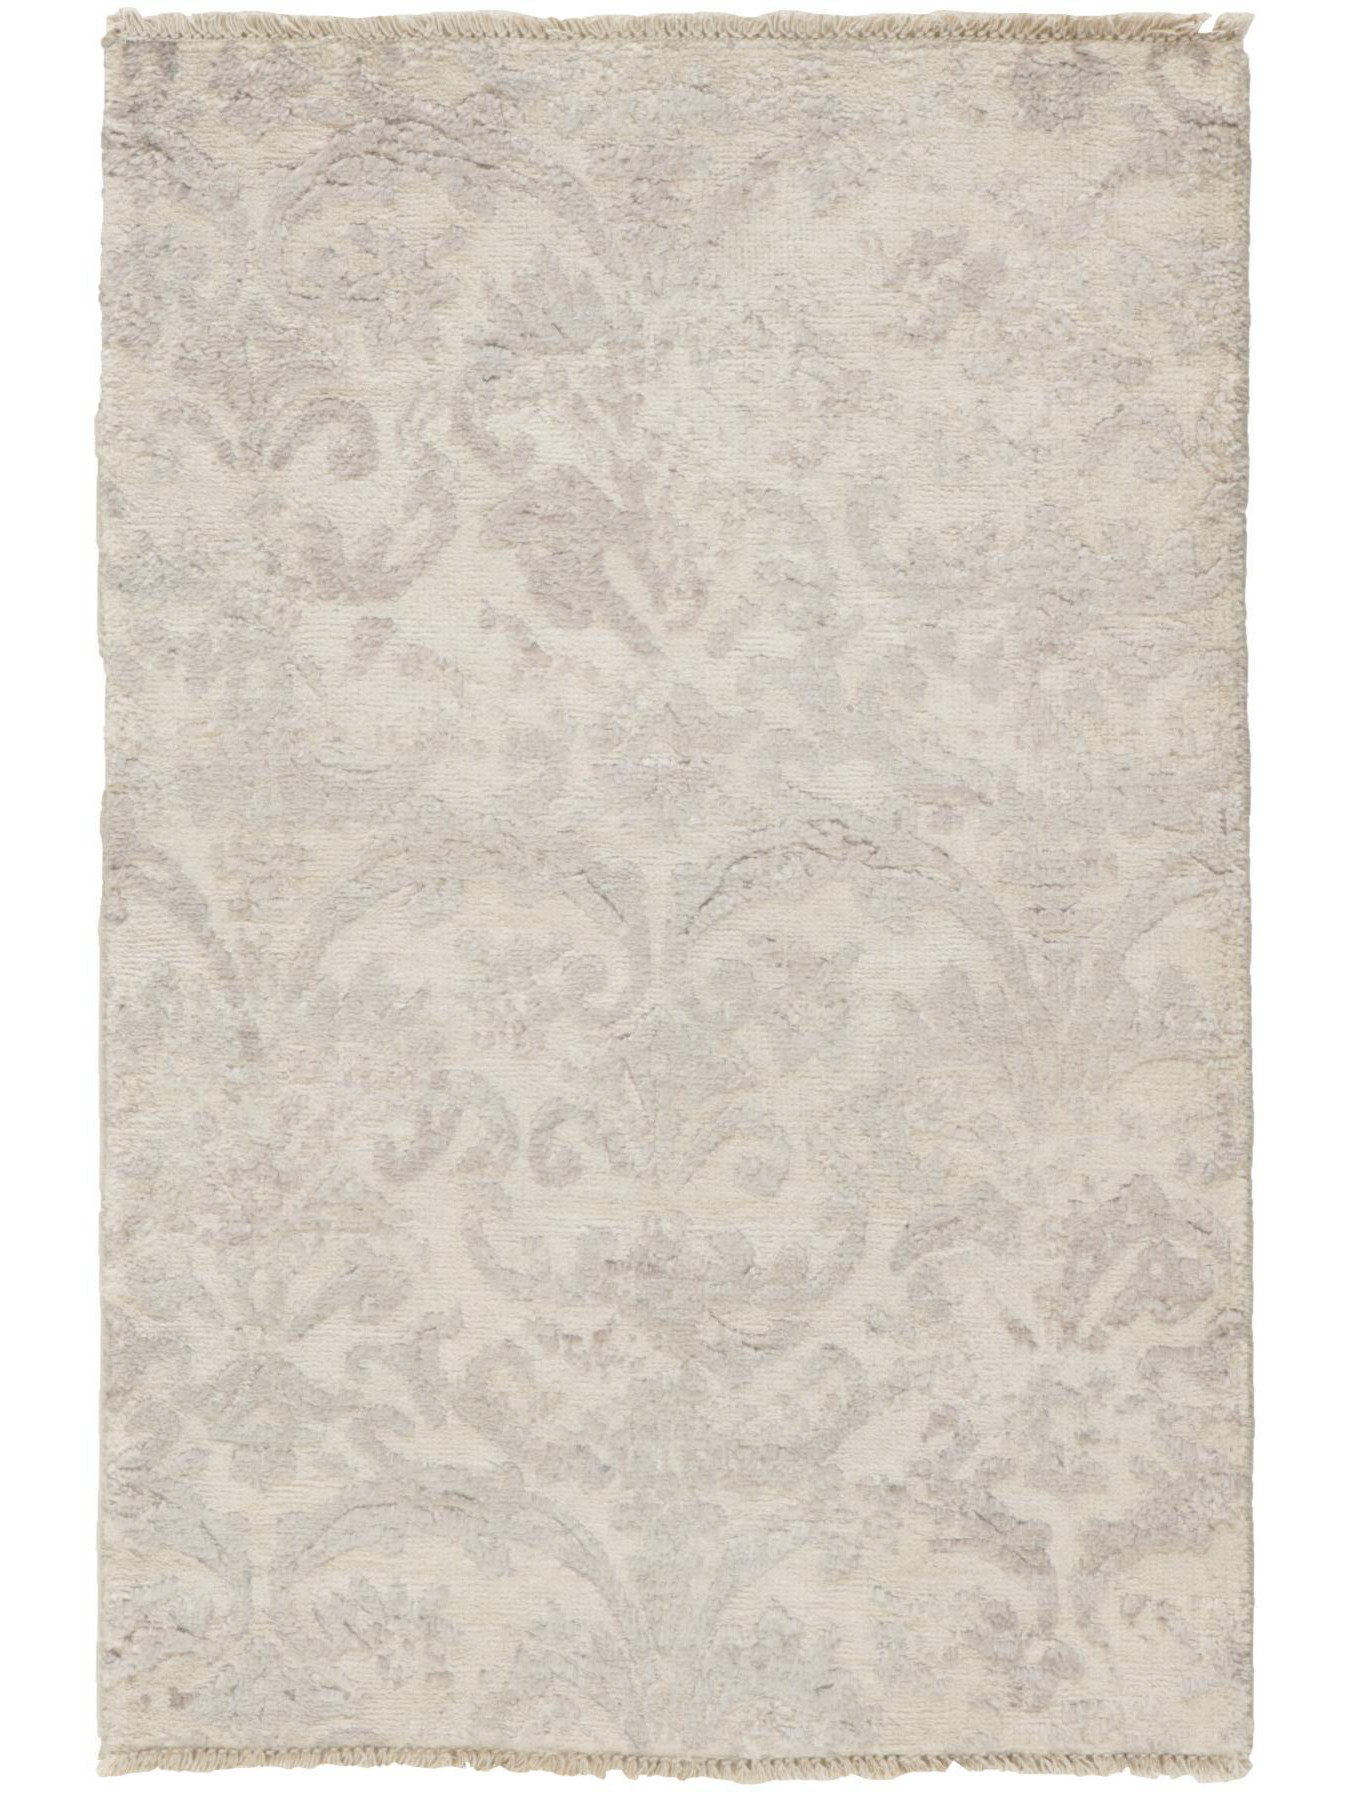 Luxury tapijten - Damask-AL-2H HB-104/B-14